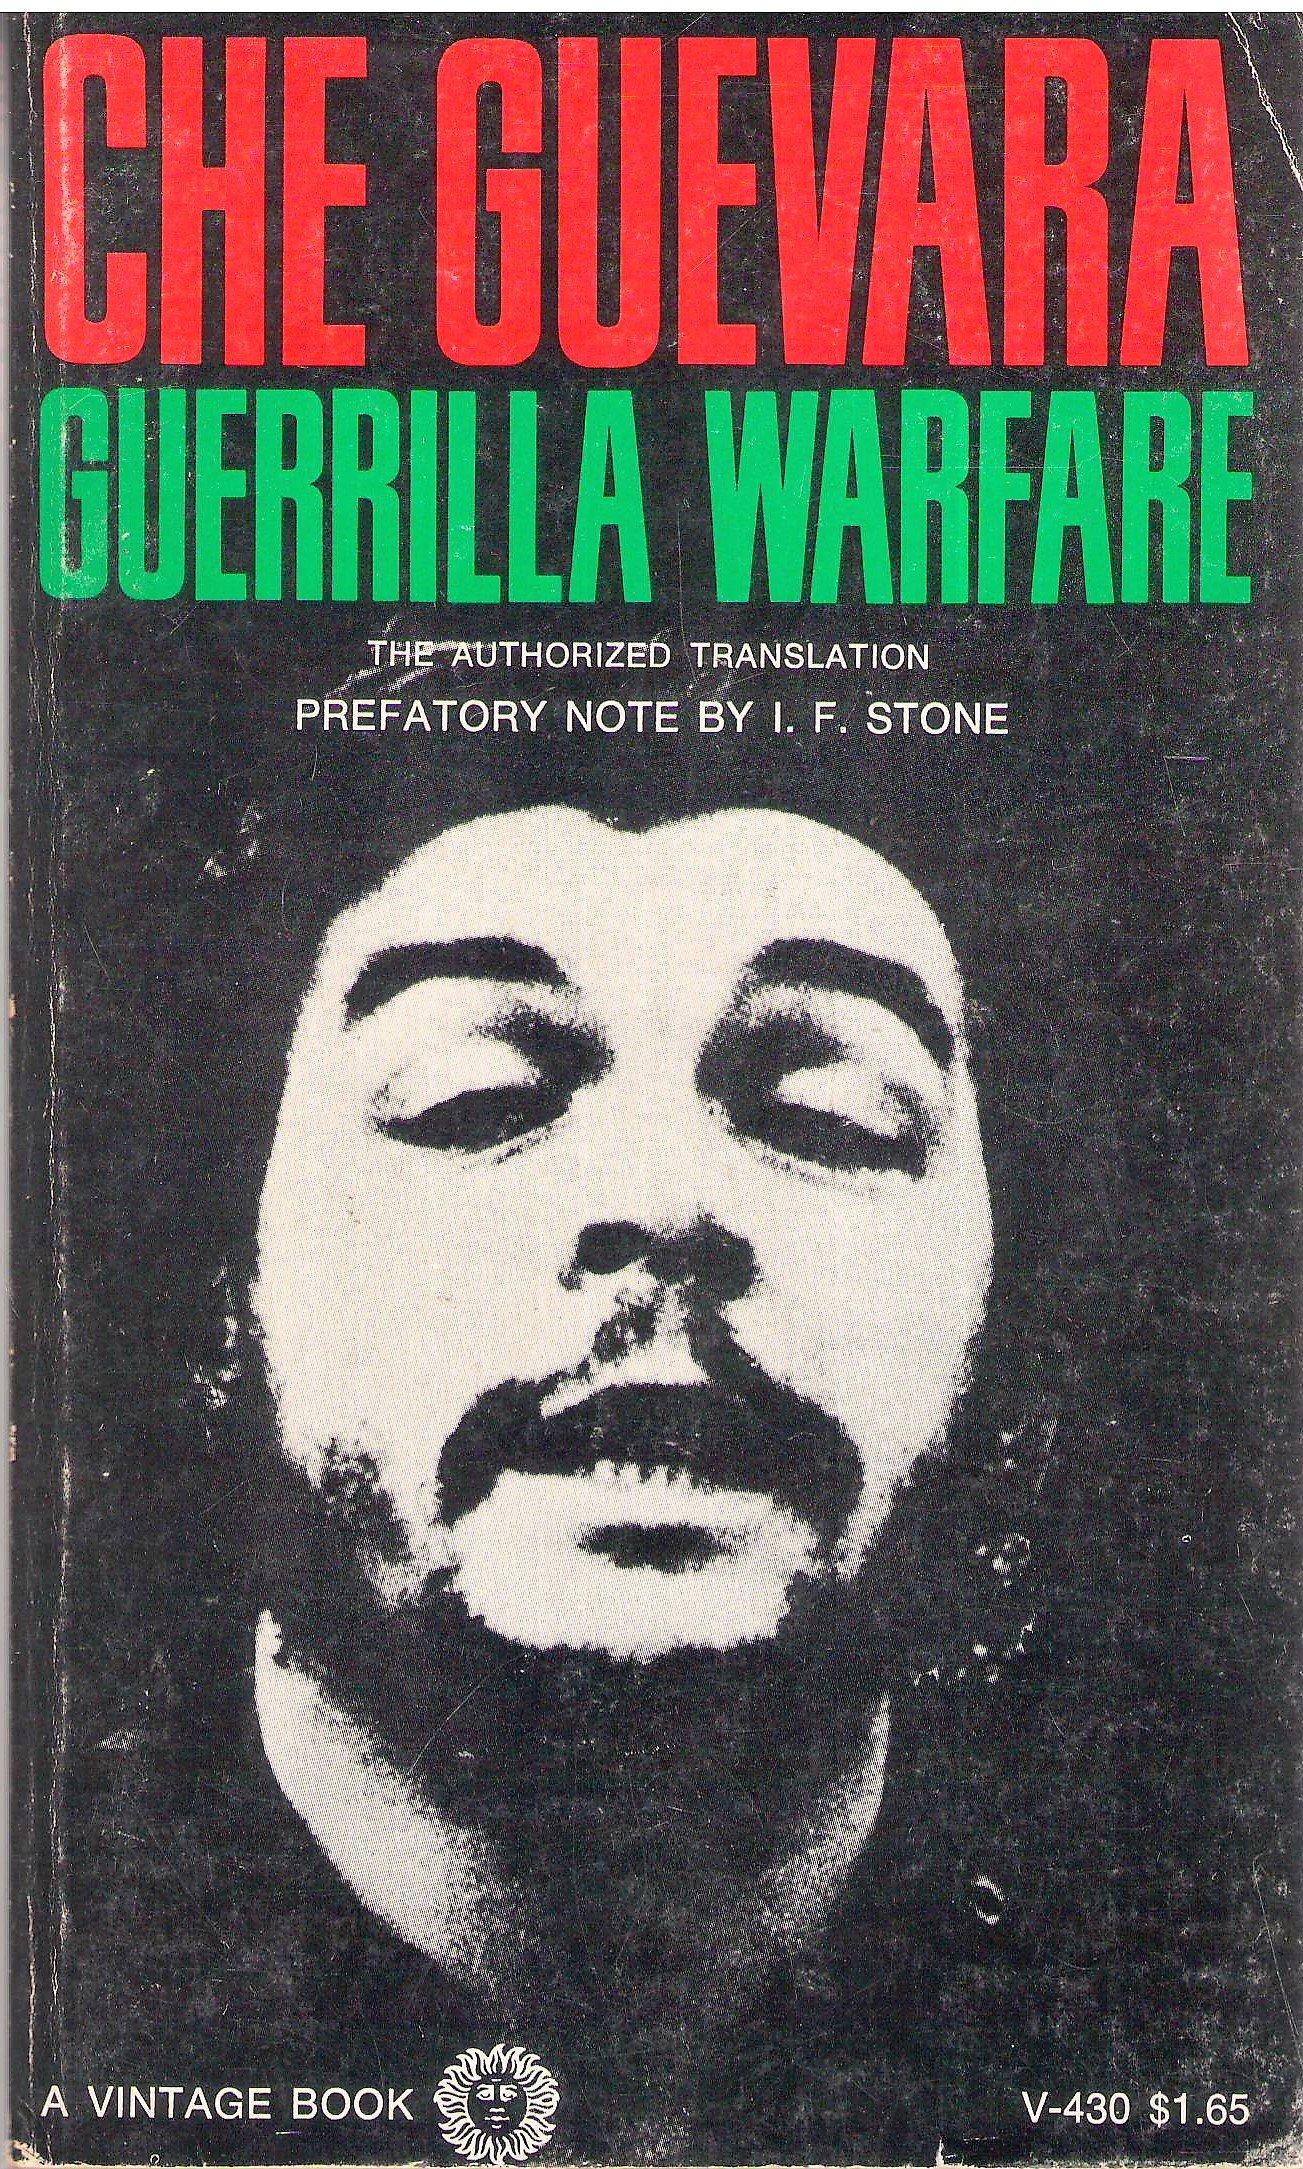 Guerrilla Warfare: the Authorized Translation, Che Guevara